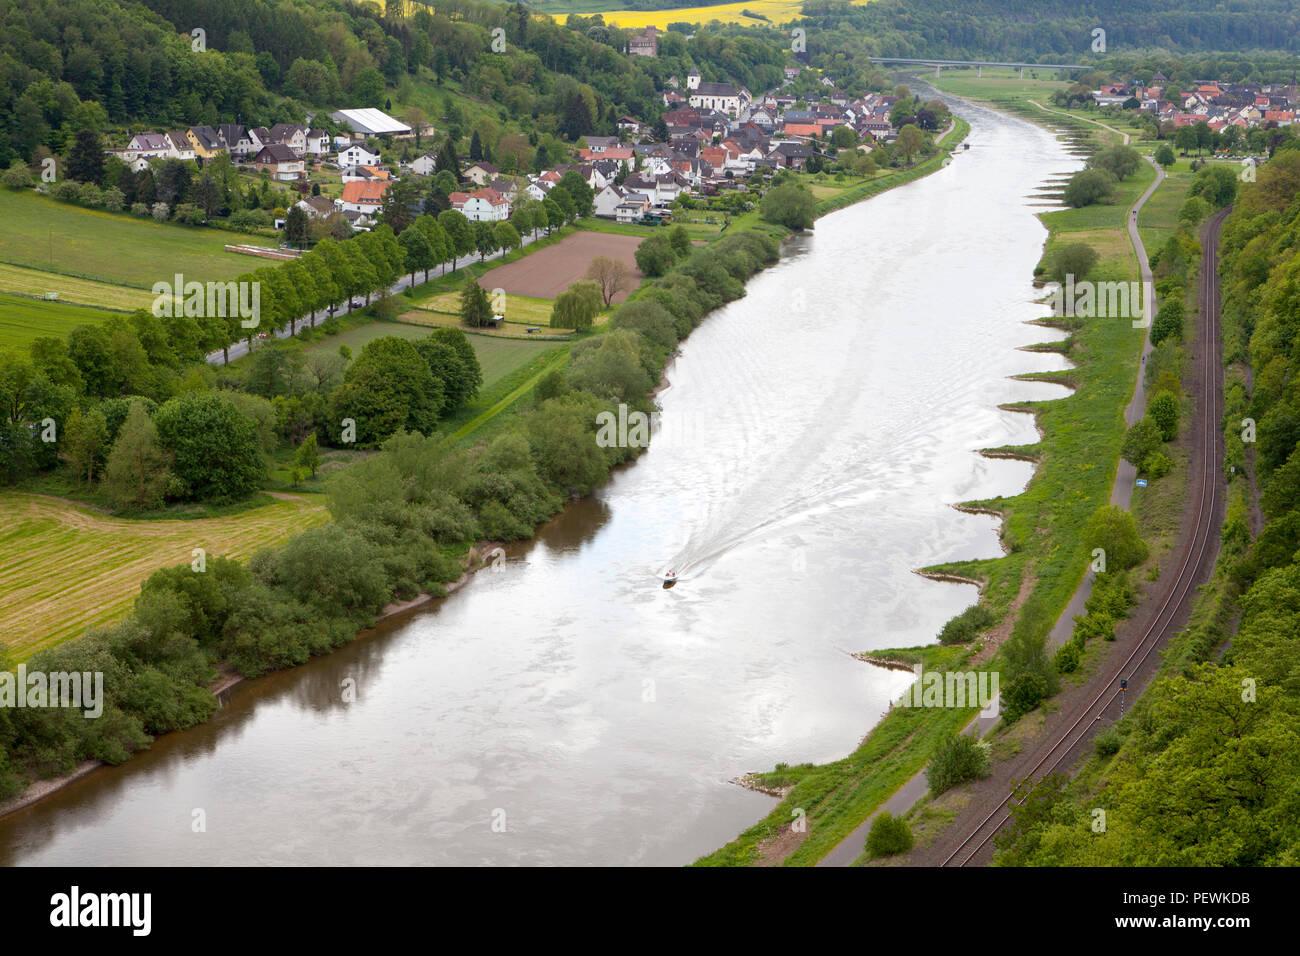 View from the Skywalk on River Weser, Beverungen, Weser Uplands, North Rhine-Westphalia, Germany, Europe - Stock Image